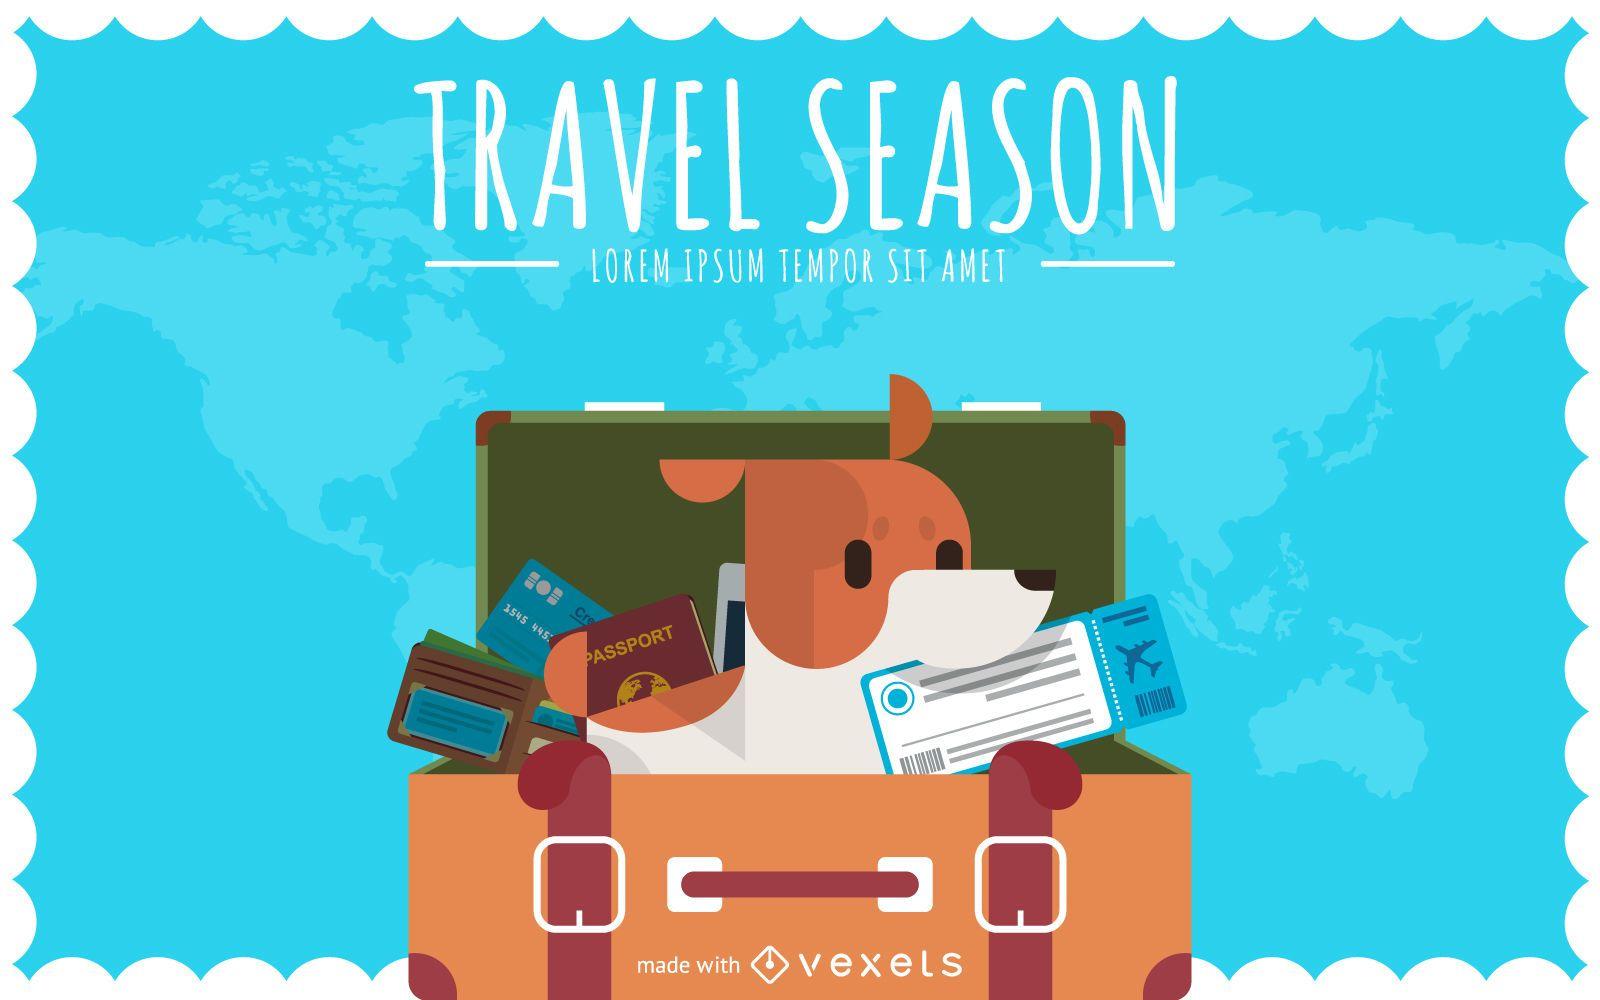 Creador de carteles de viajes planos